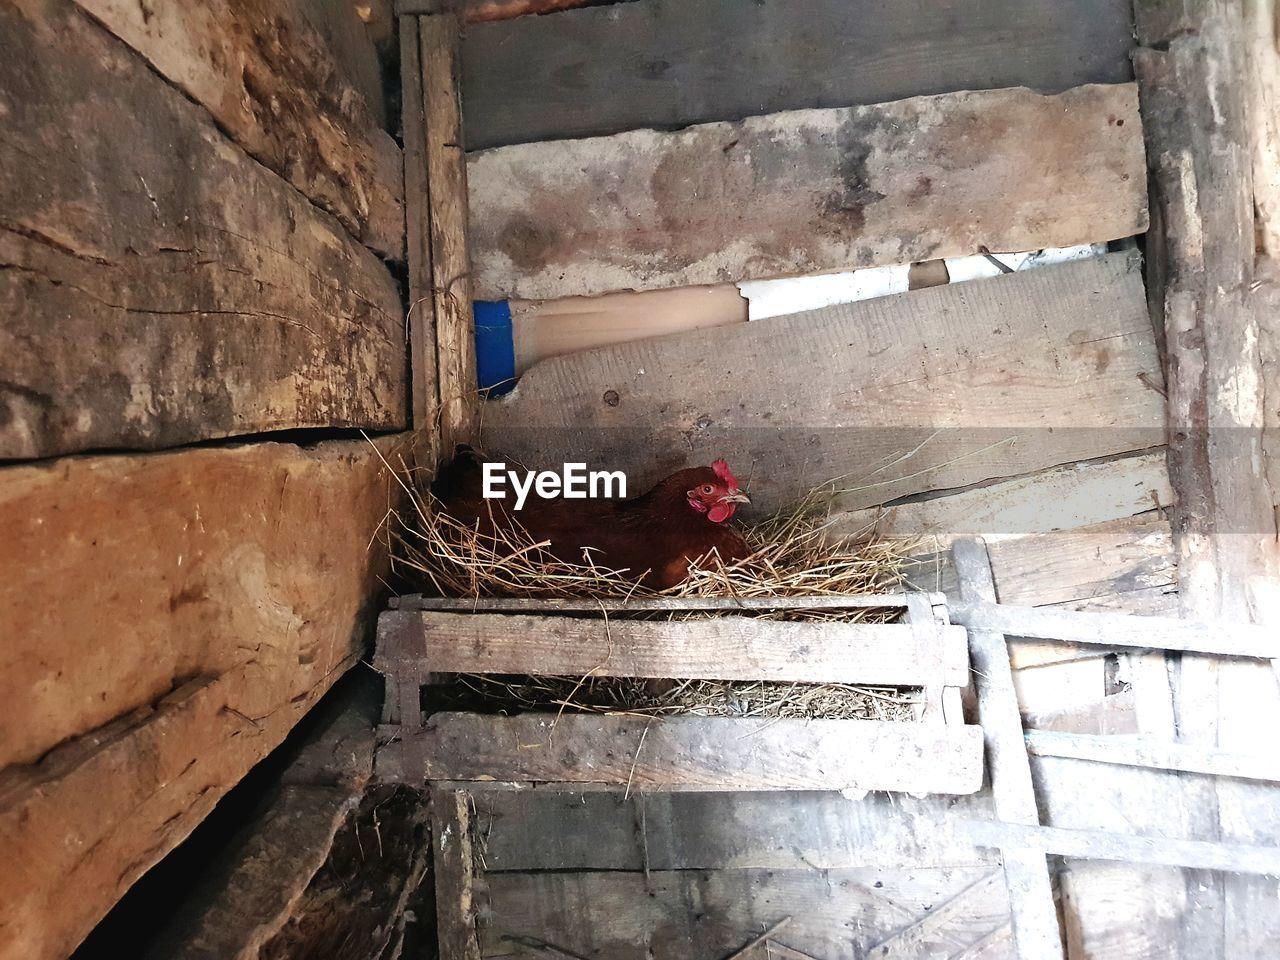 domestic animals, chicken - bird, livestock, no people, architecture, one animal, day, animal themes, built structure, mammal, indoors, bird